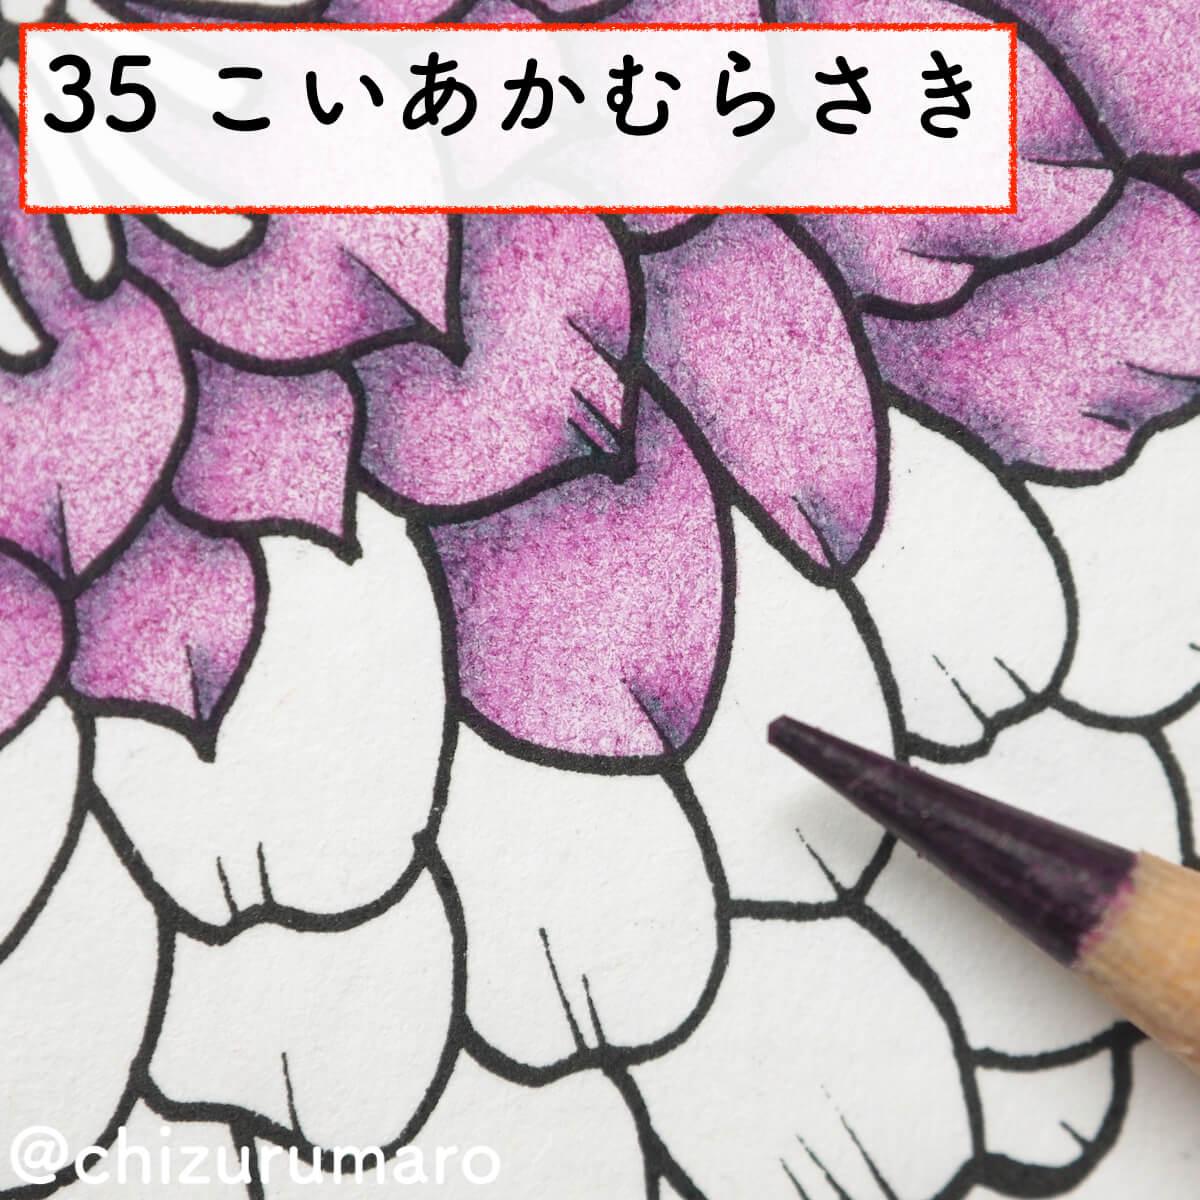 f:id:chizurumaro:20200311152008j:plain